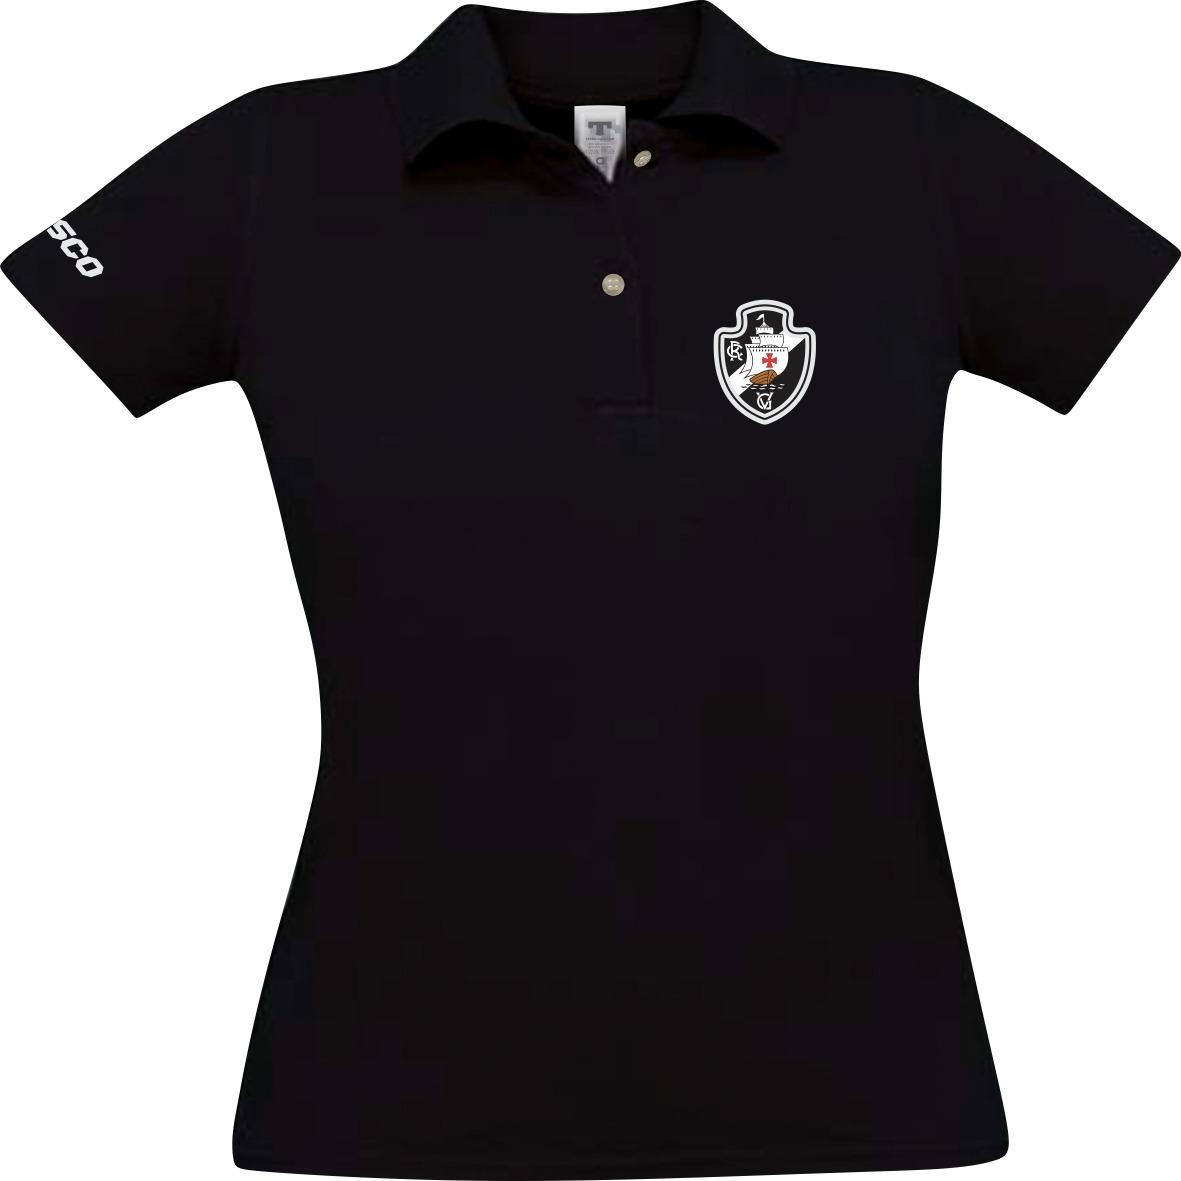 Camiseta Camisa Polo Feminina Do Vasco 91da0e965e978